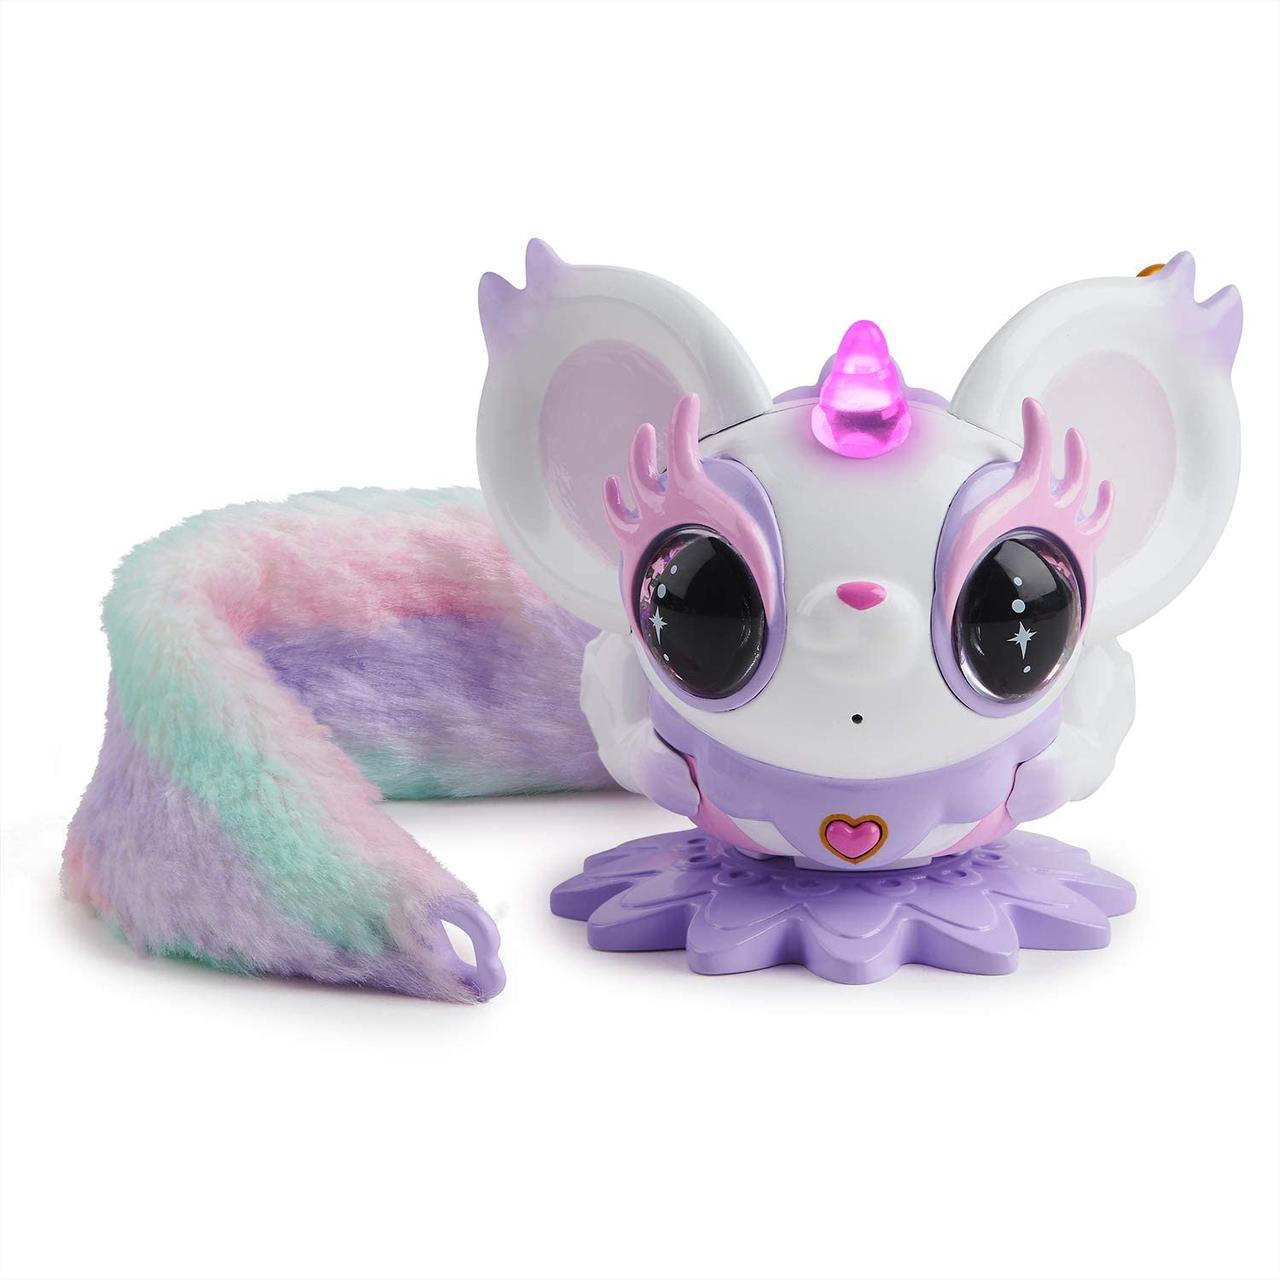 Интерактивная игрушка Эсми WowWee pixie pelles Esme белая с фиолетовым музыкальная